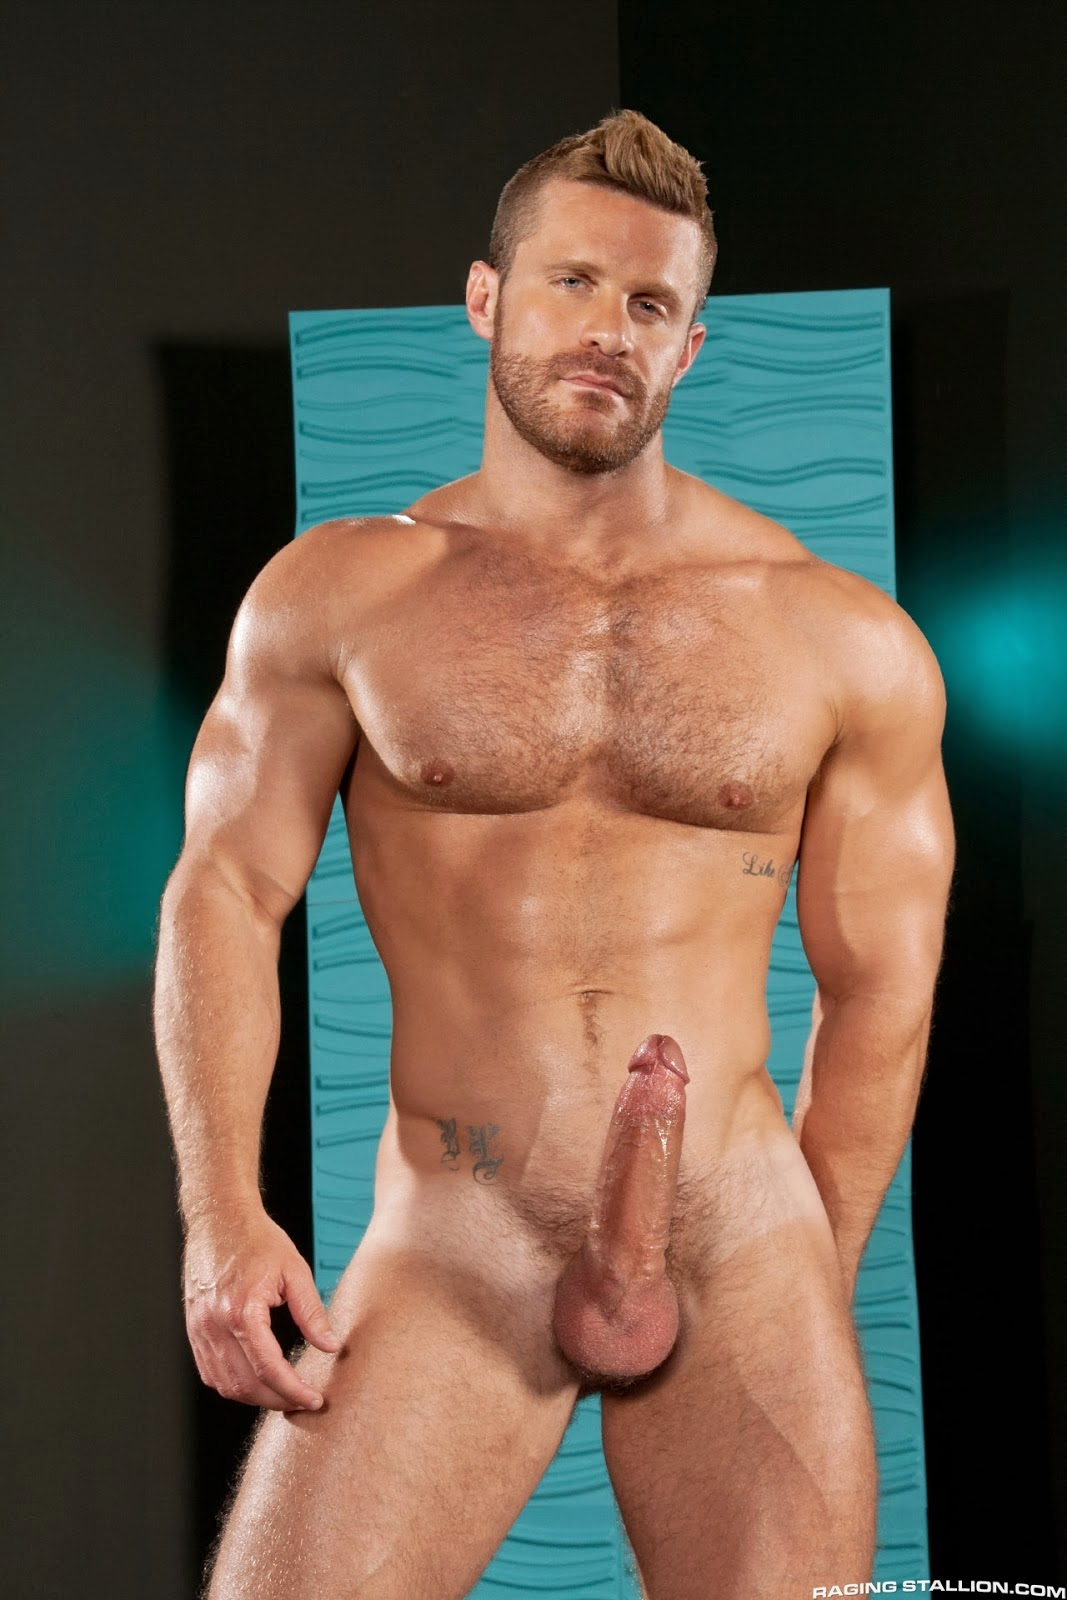 Hot naked male porn stars